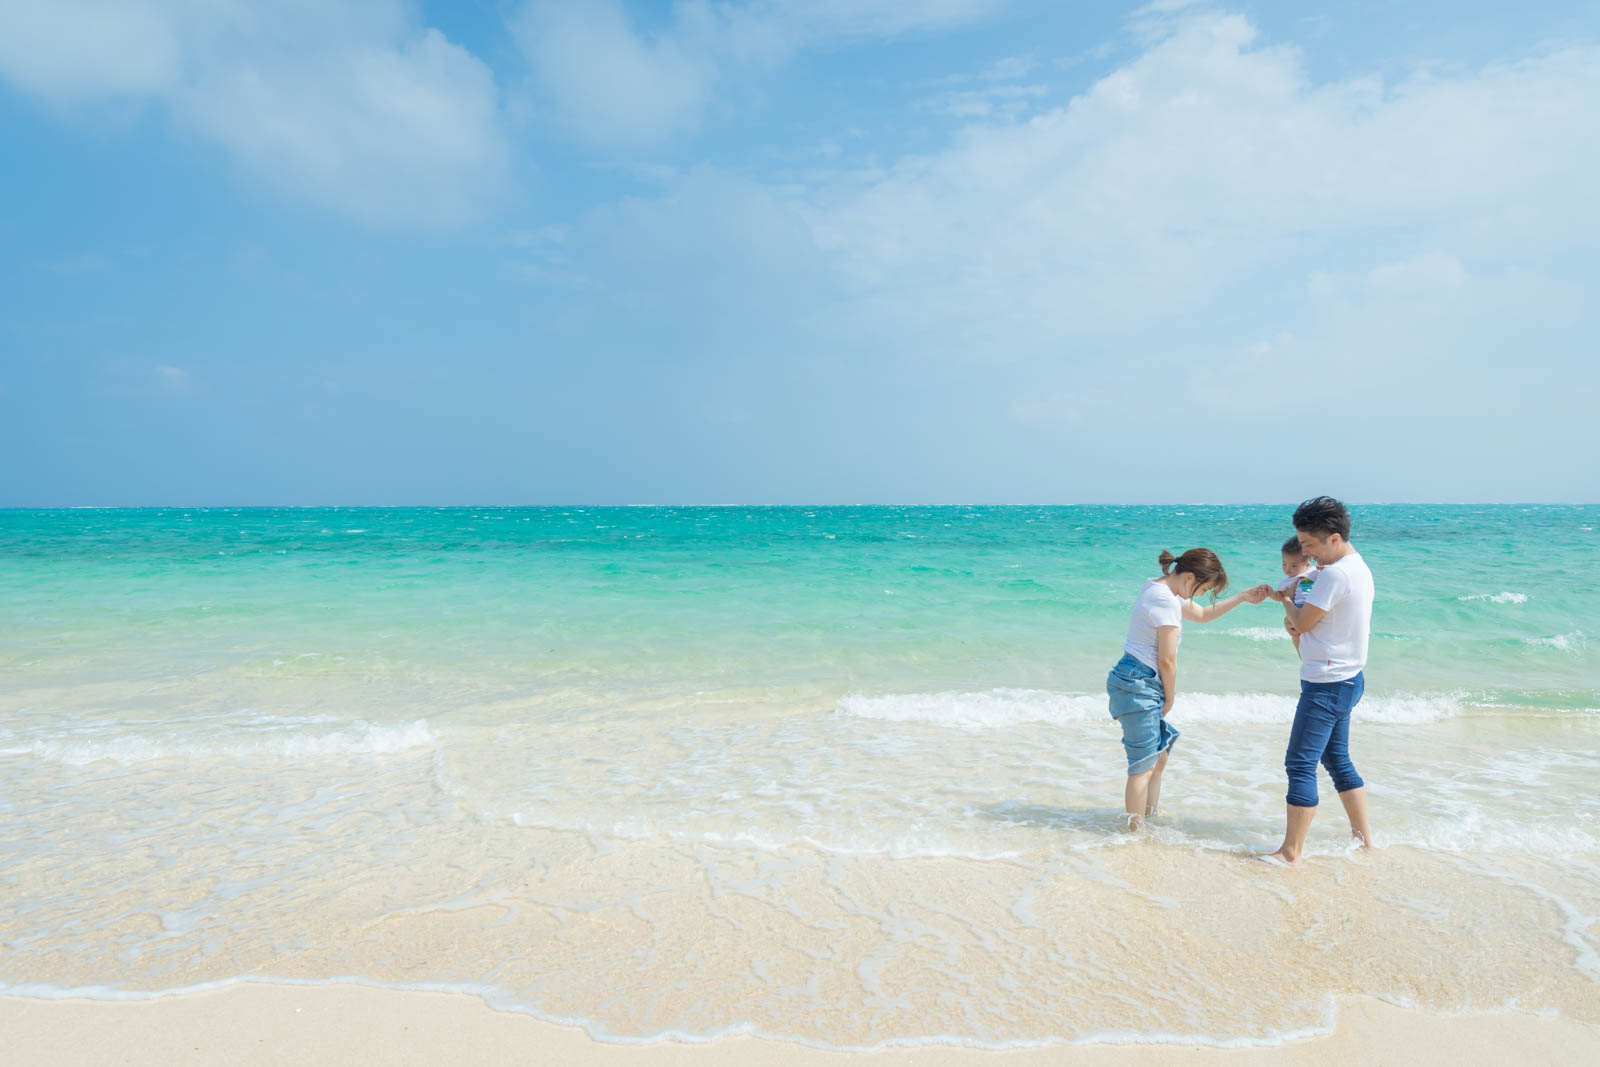 beach at Kohama island